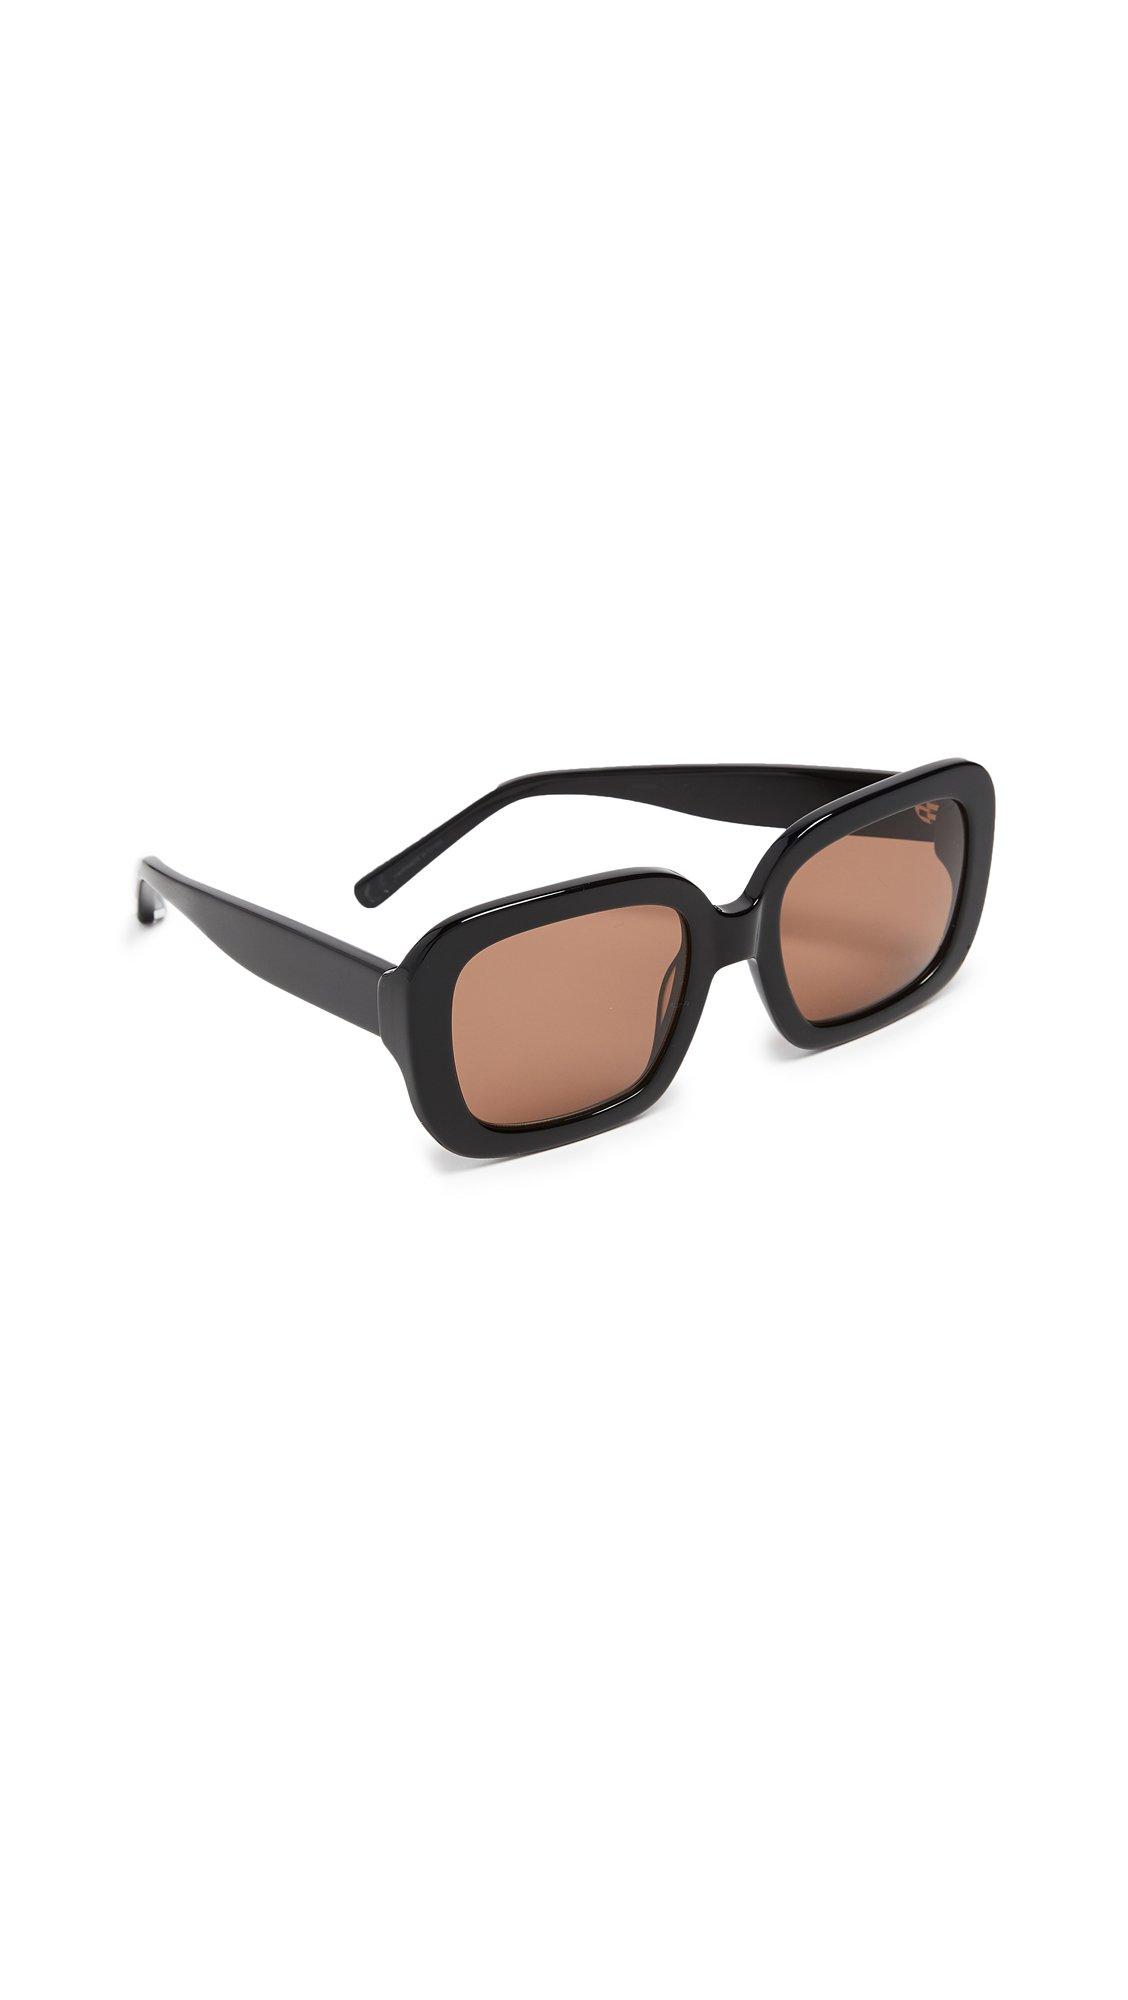 Elizabeth and James Women's Haley Square Sunglasses, Black, 53 mm